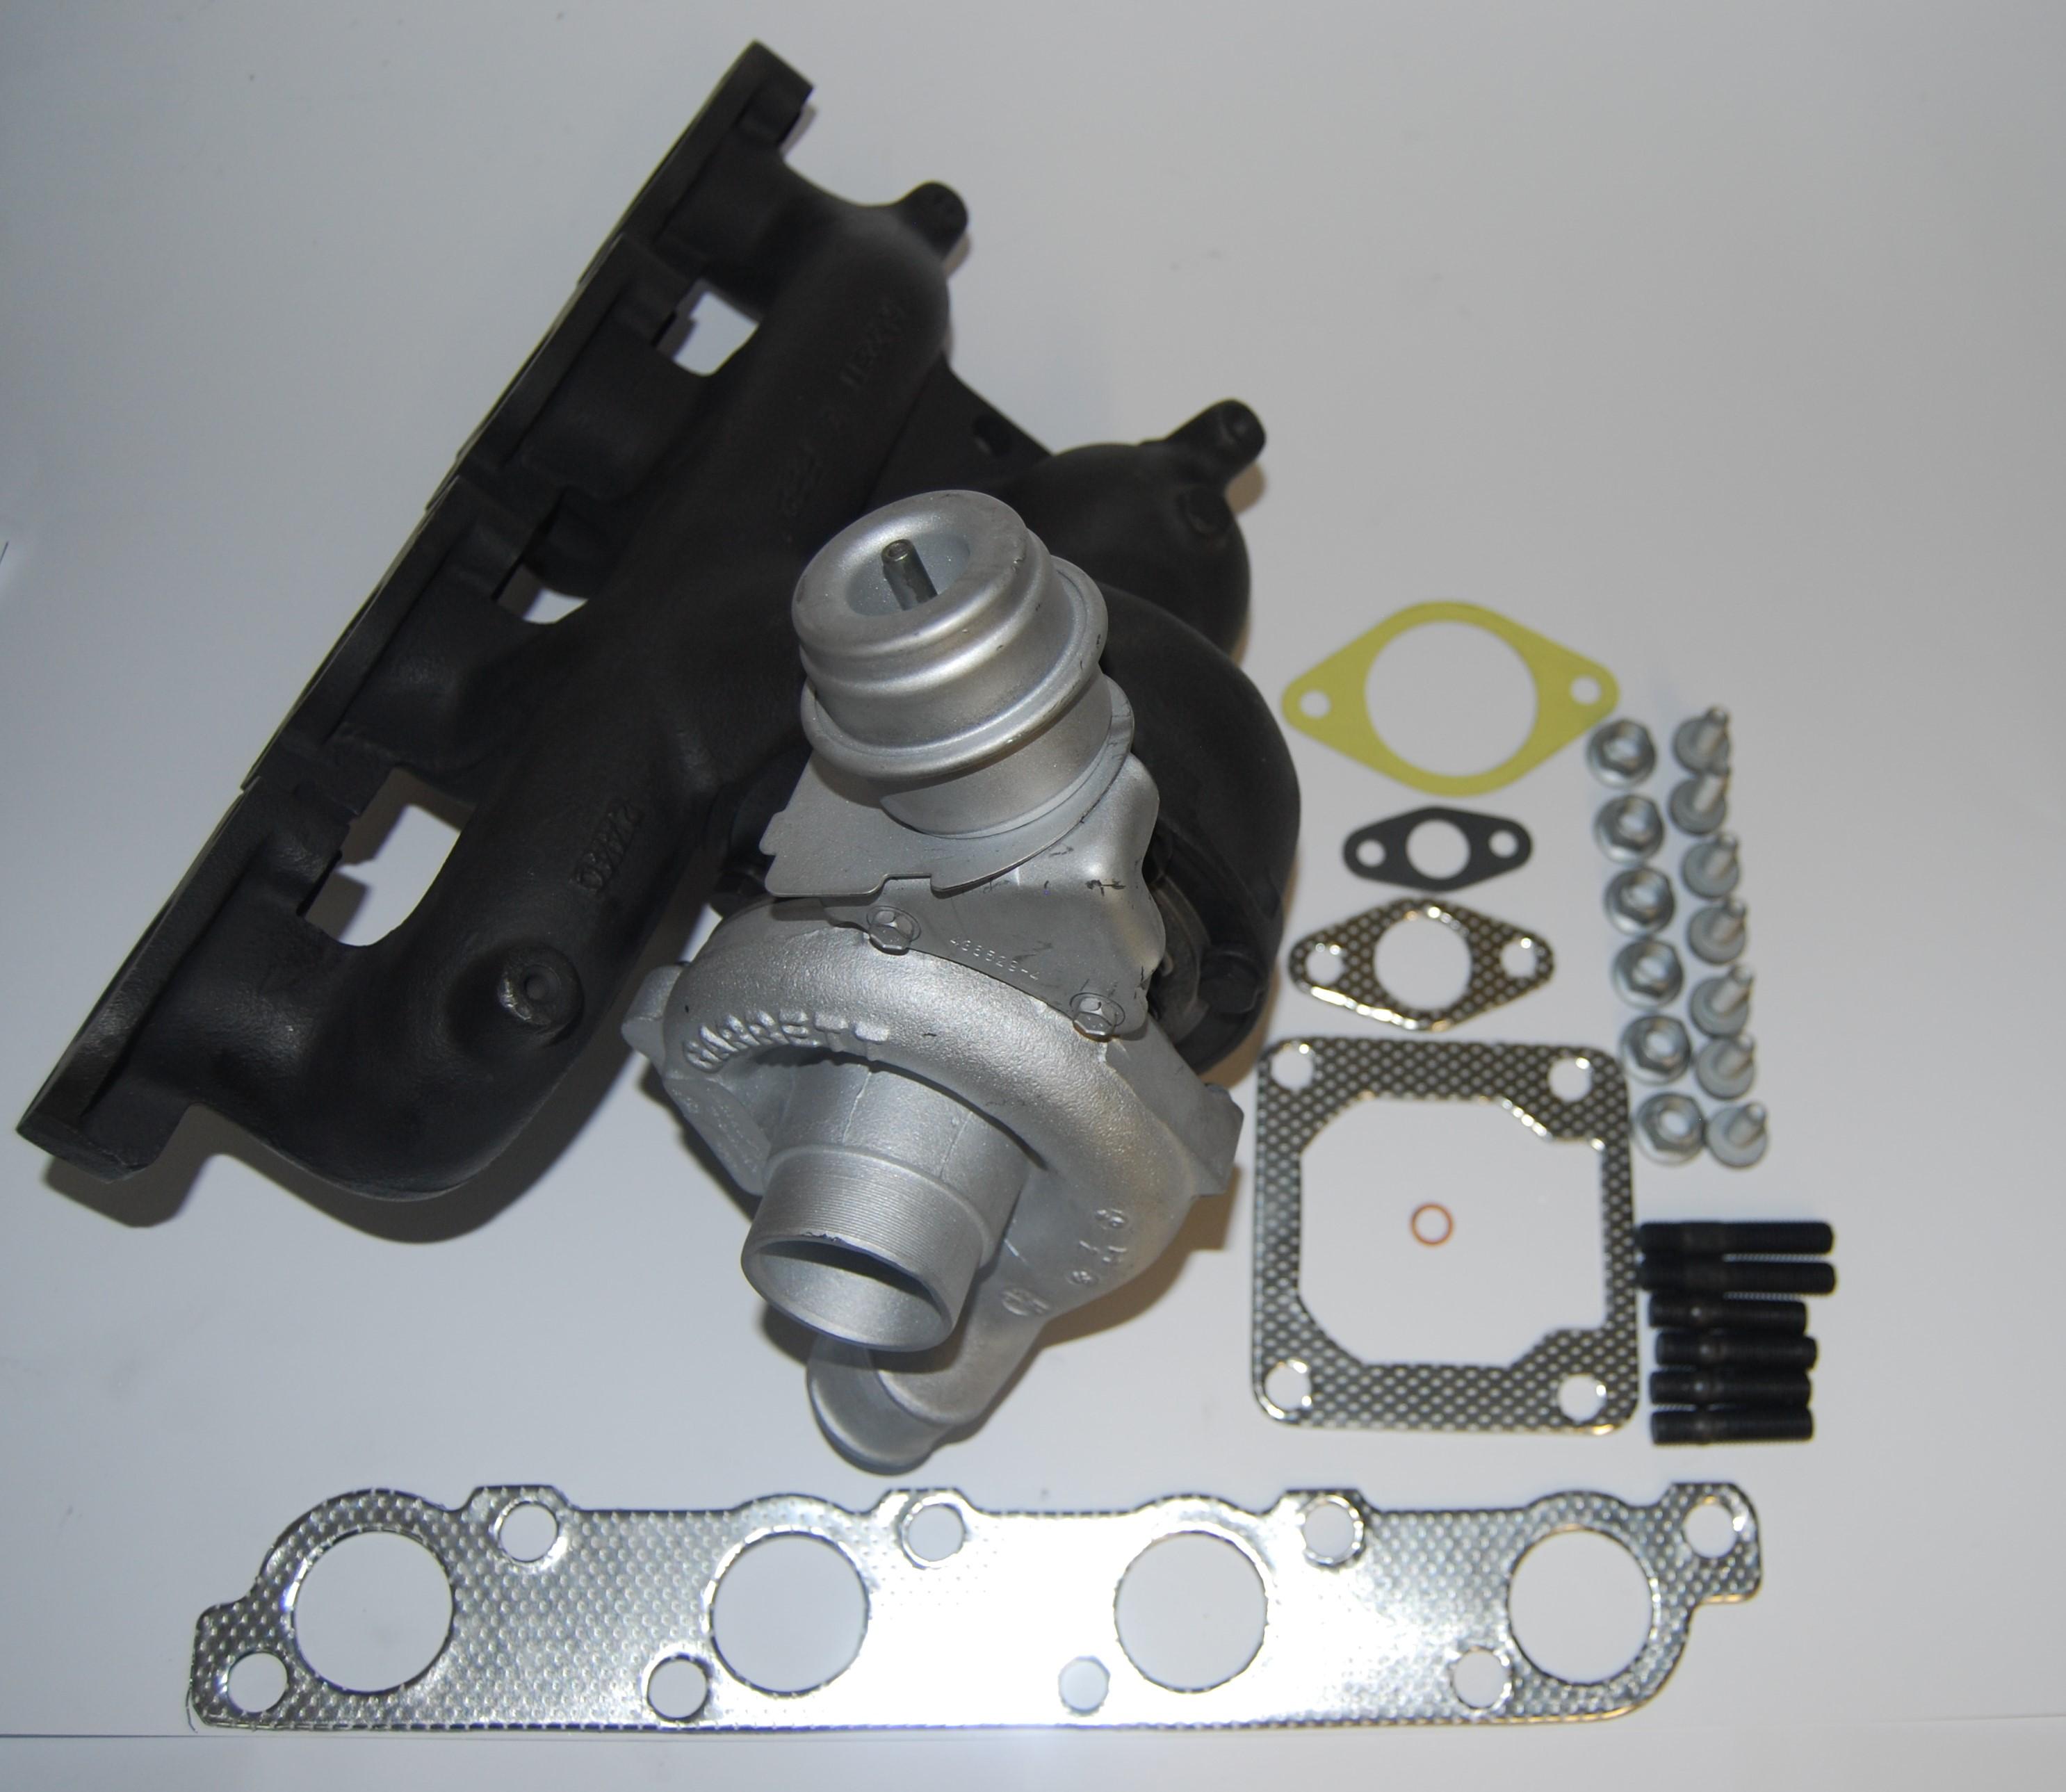 Turbolader JAGUAR X-TYPE 2.0 DI Duratorq DI 130Ps  714467 3S7Q6K682AD